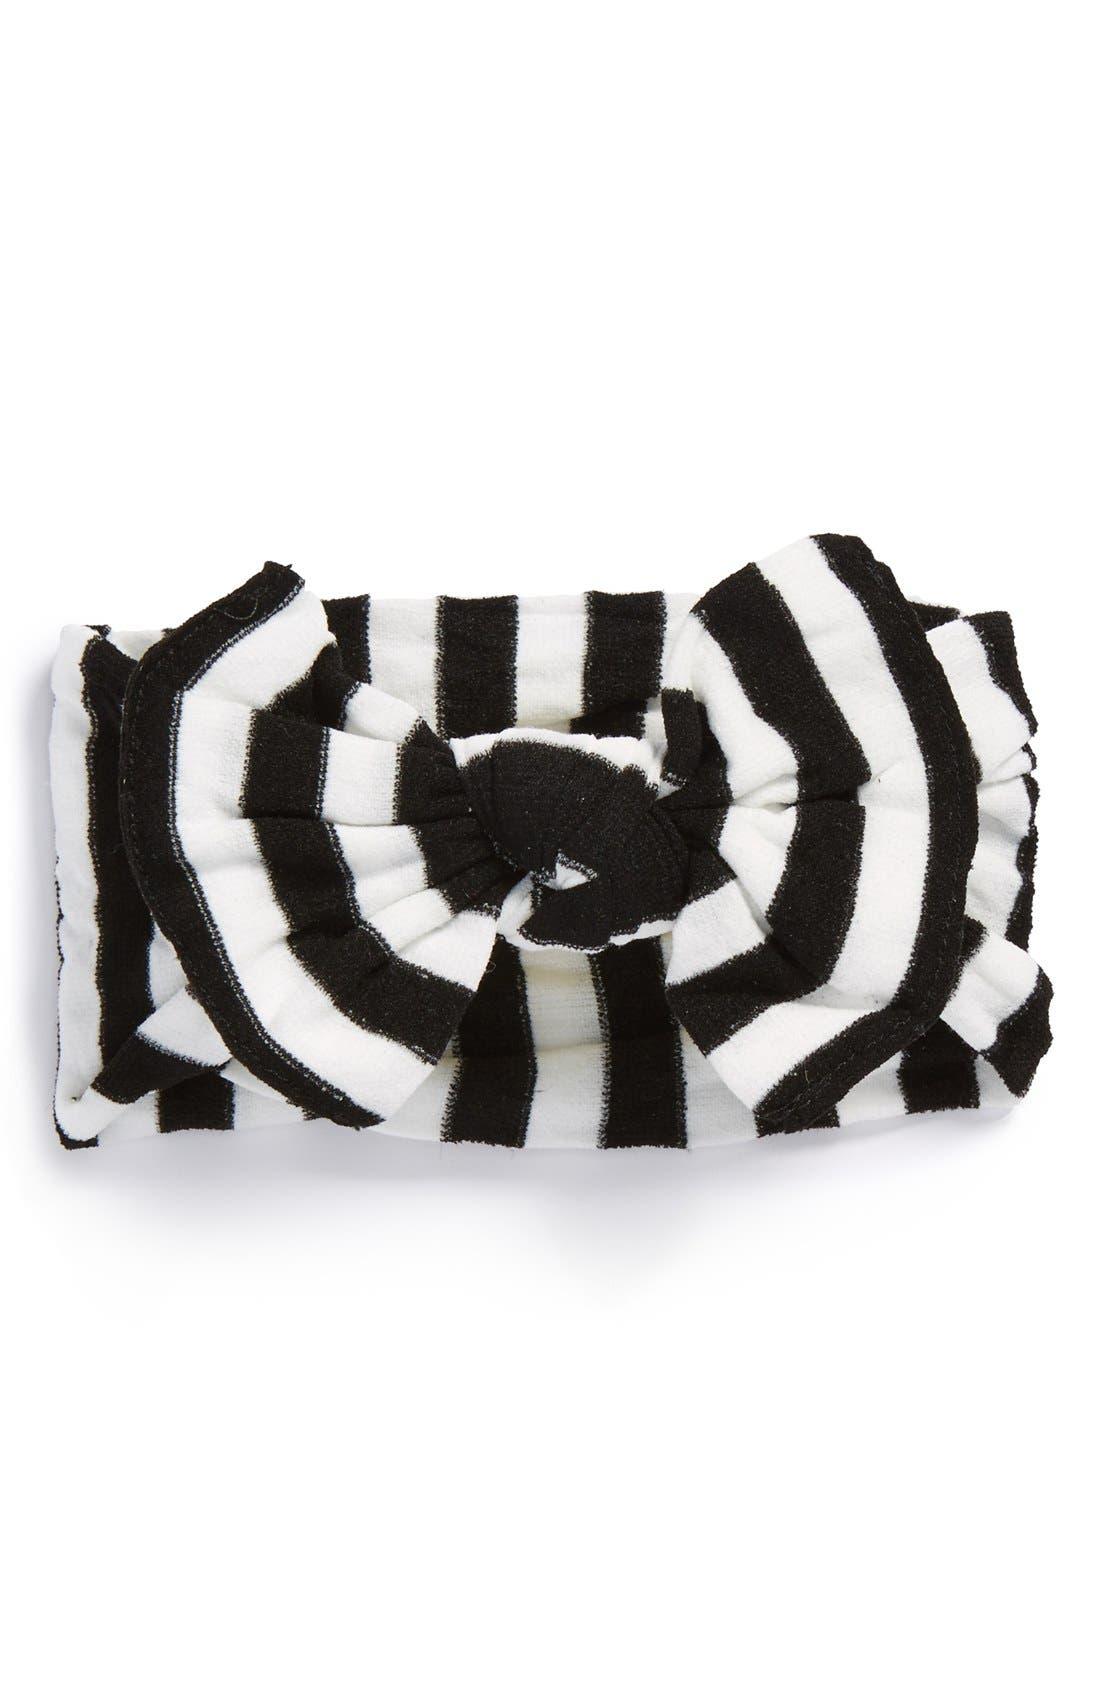 BABY BLING, Stripe Headband, Main thumbnail 1, color, BLACK